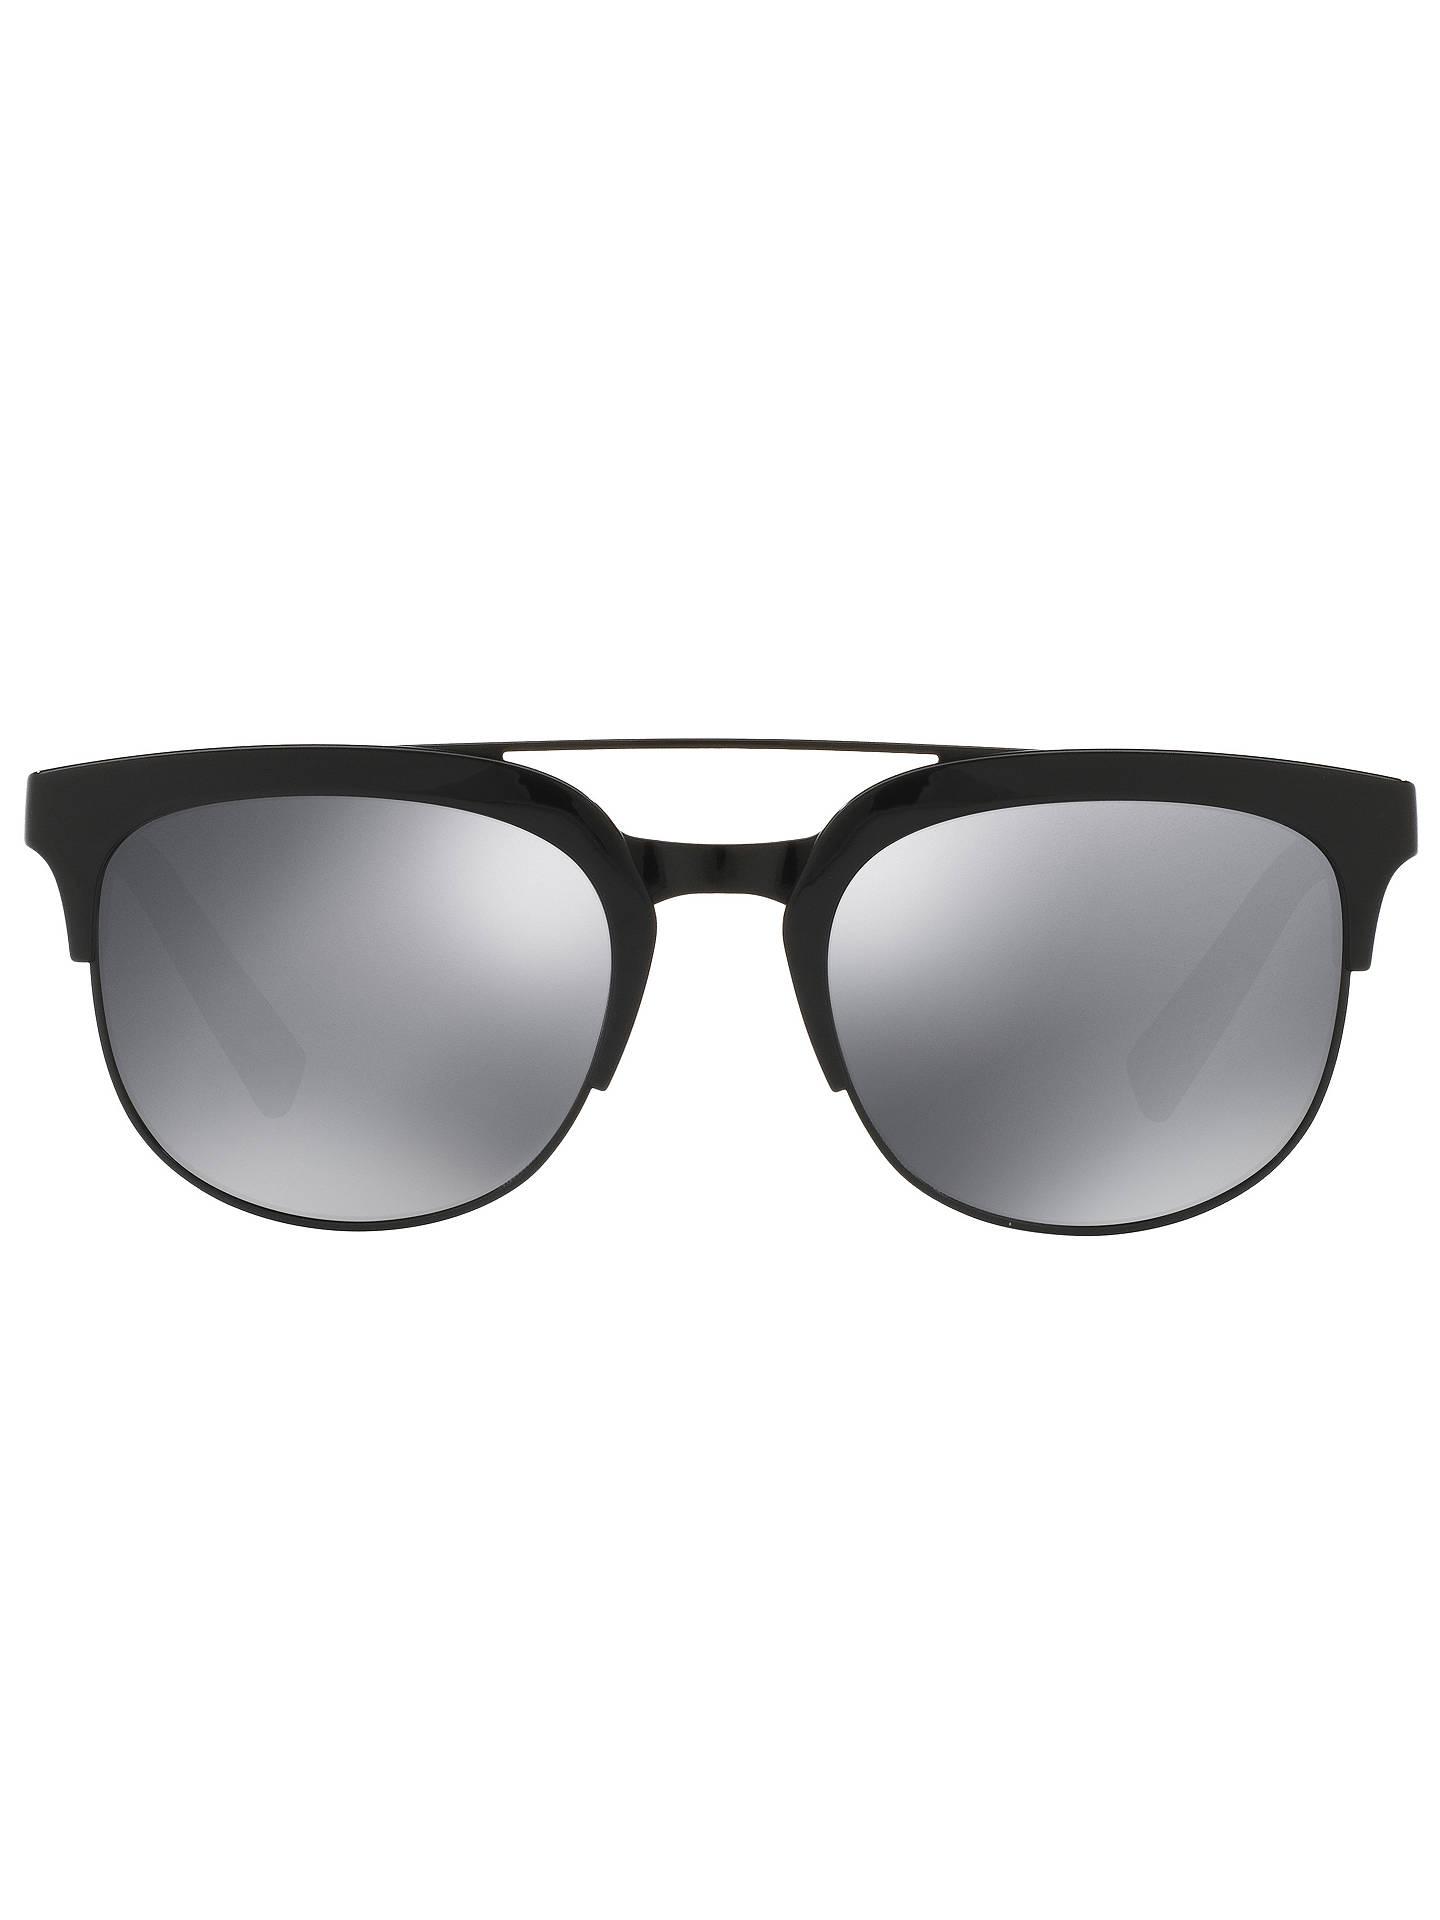 fe5420d3cc ... BuyDolce   Gabbana DG6103 Round Sunglasses